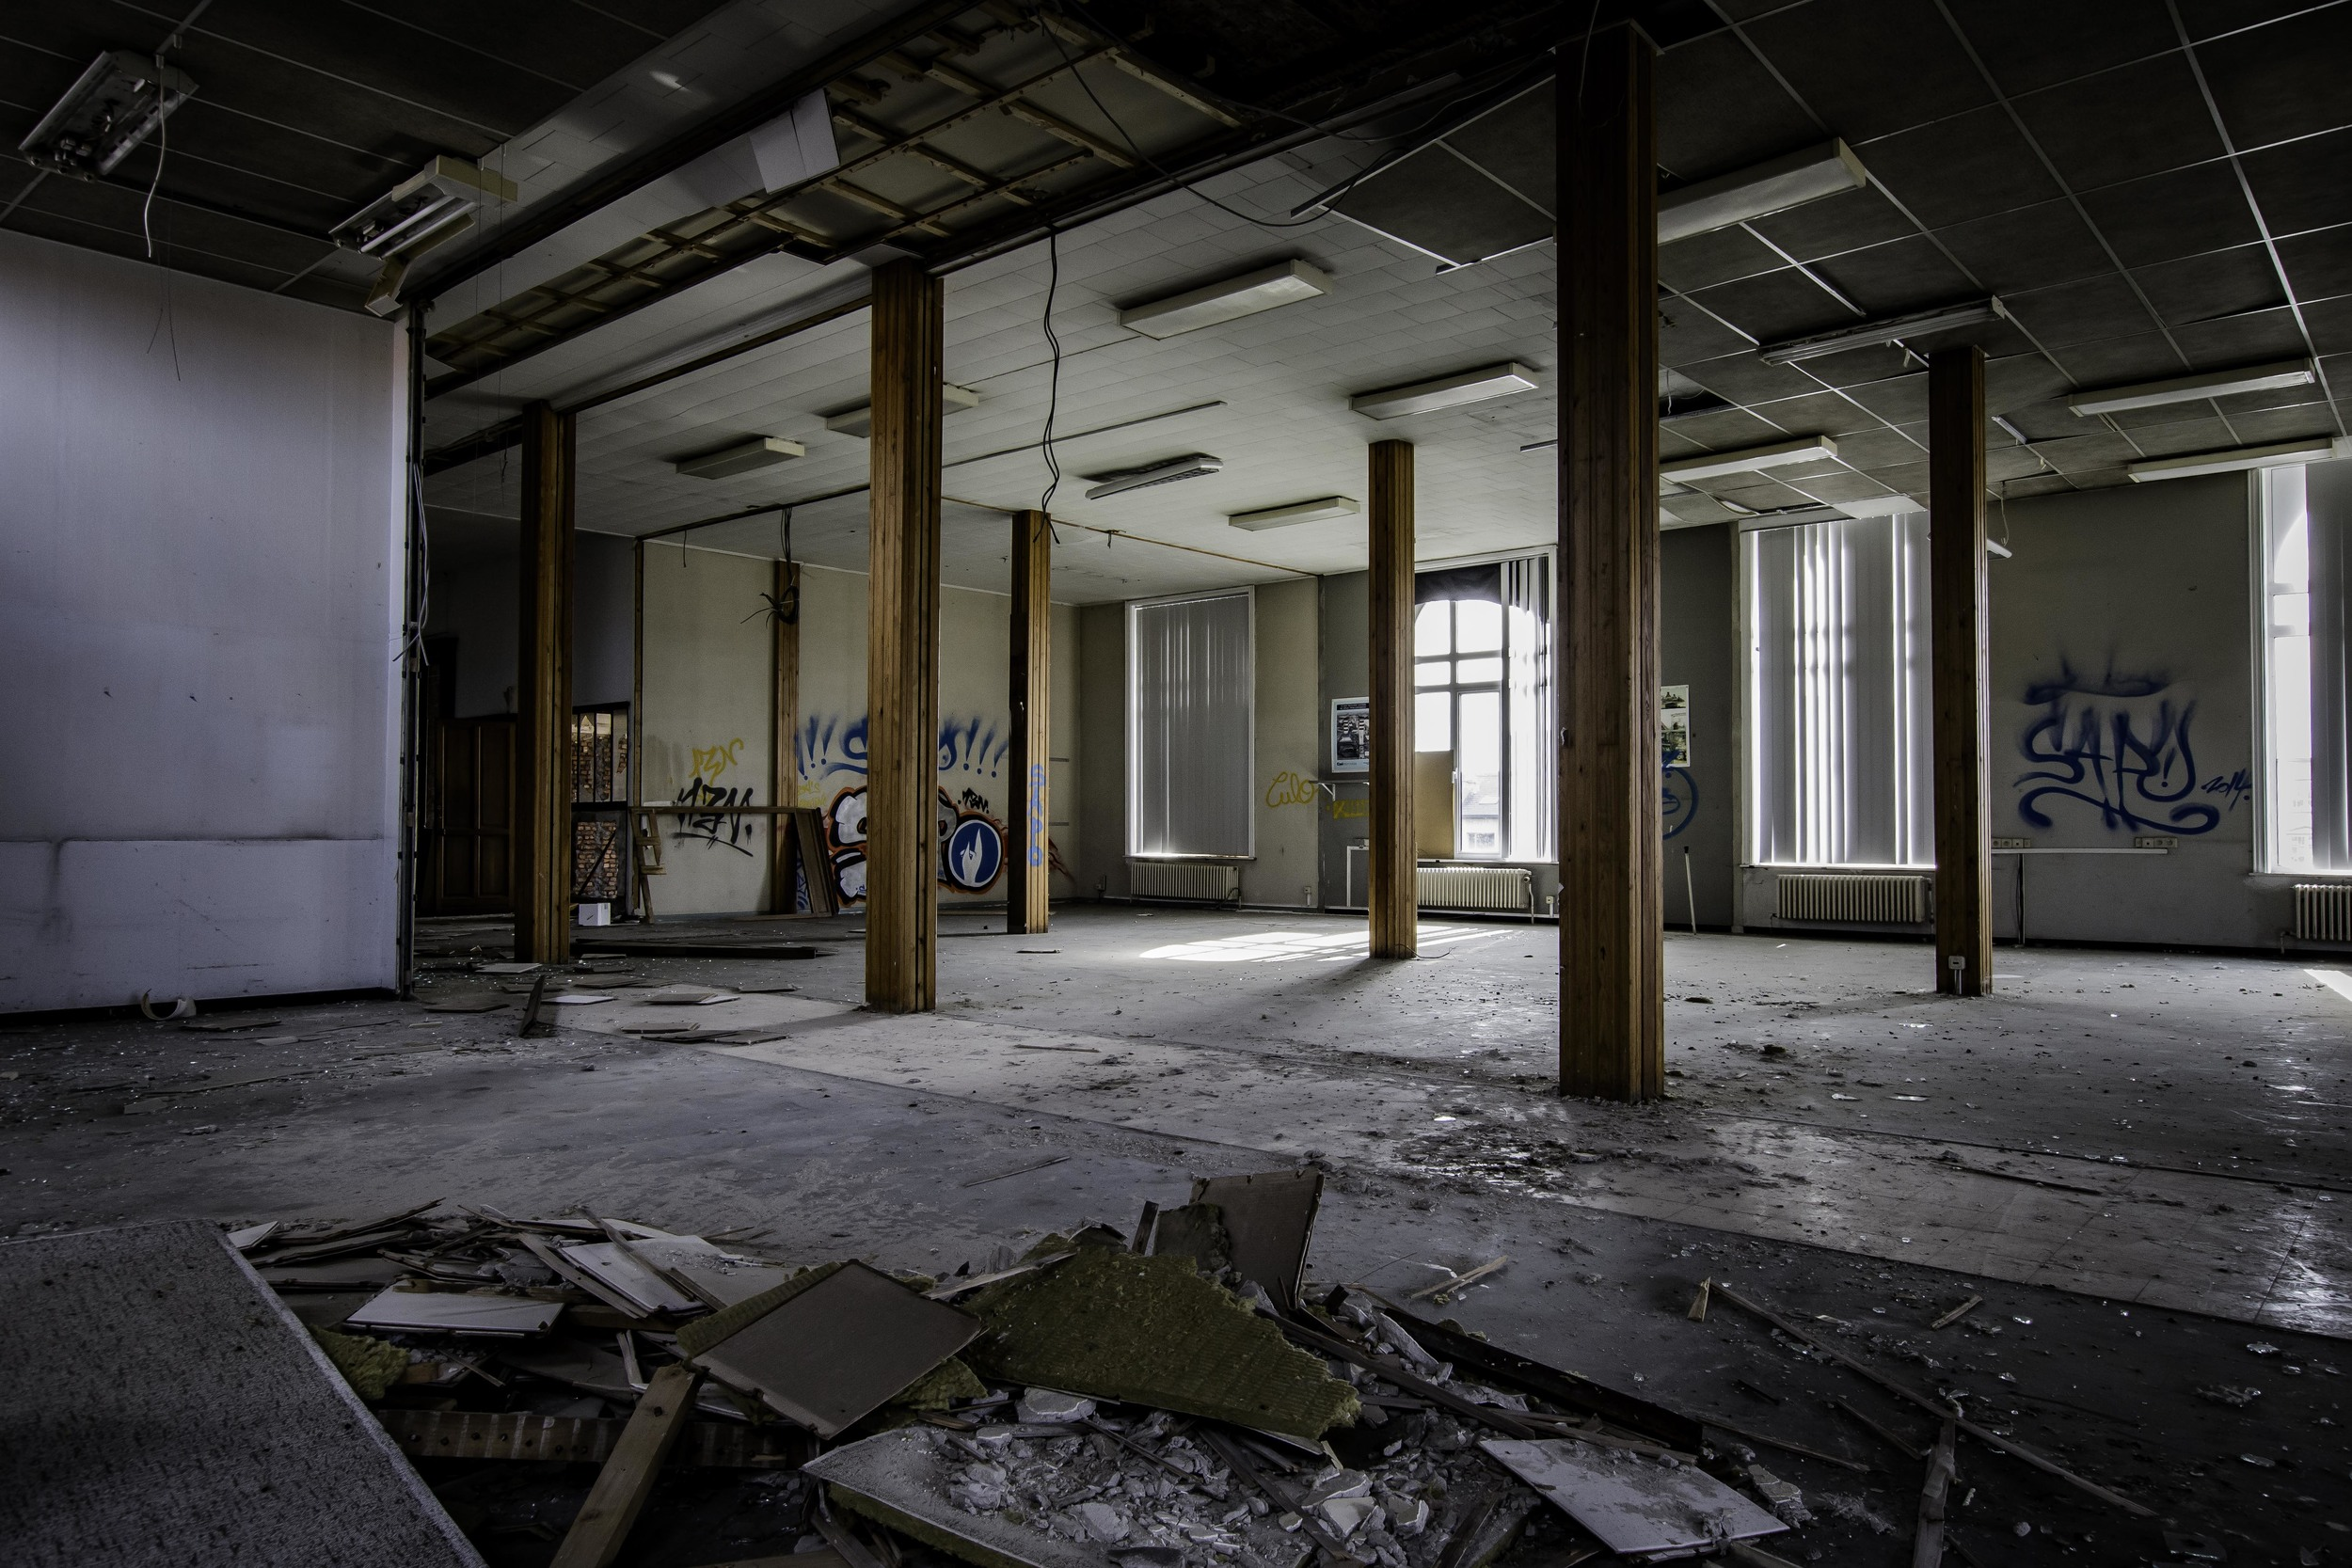 viewfinder-eigenzinnige-fotografie-urbex-vergane-glorie-oude-papierfabriek-bedienden-bureaus